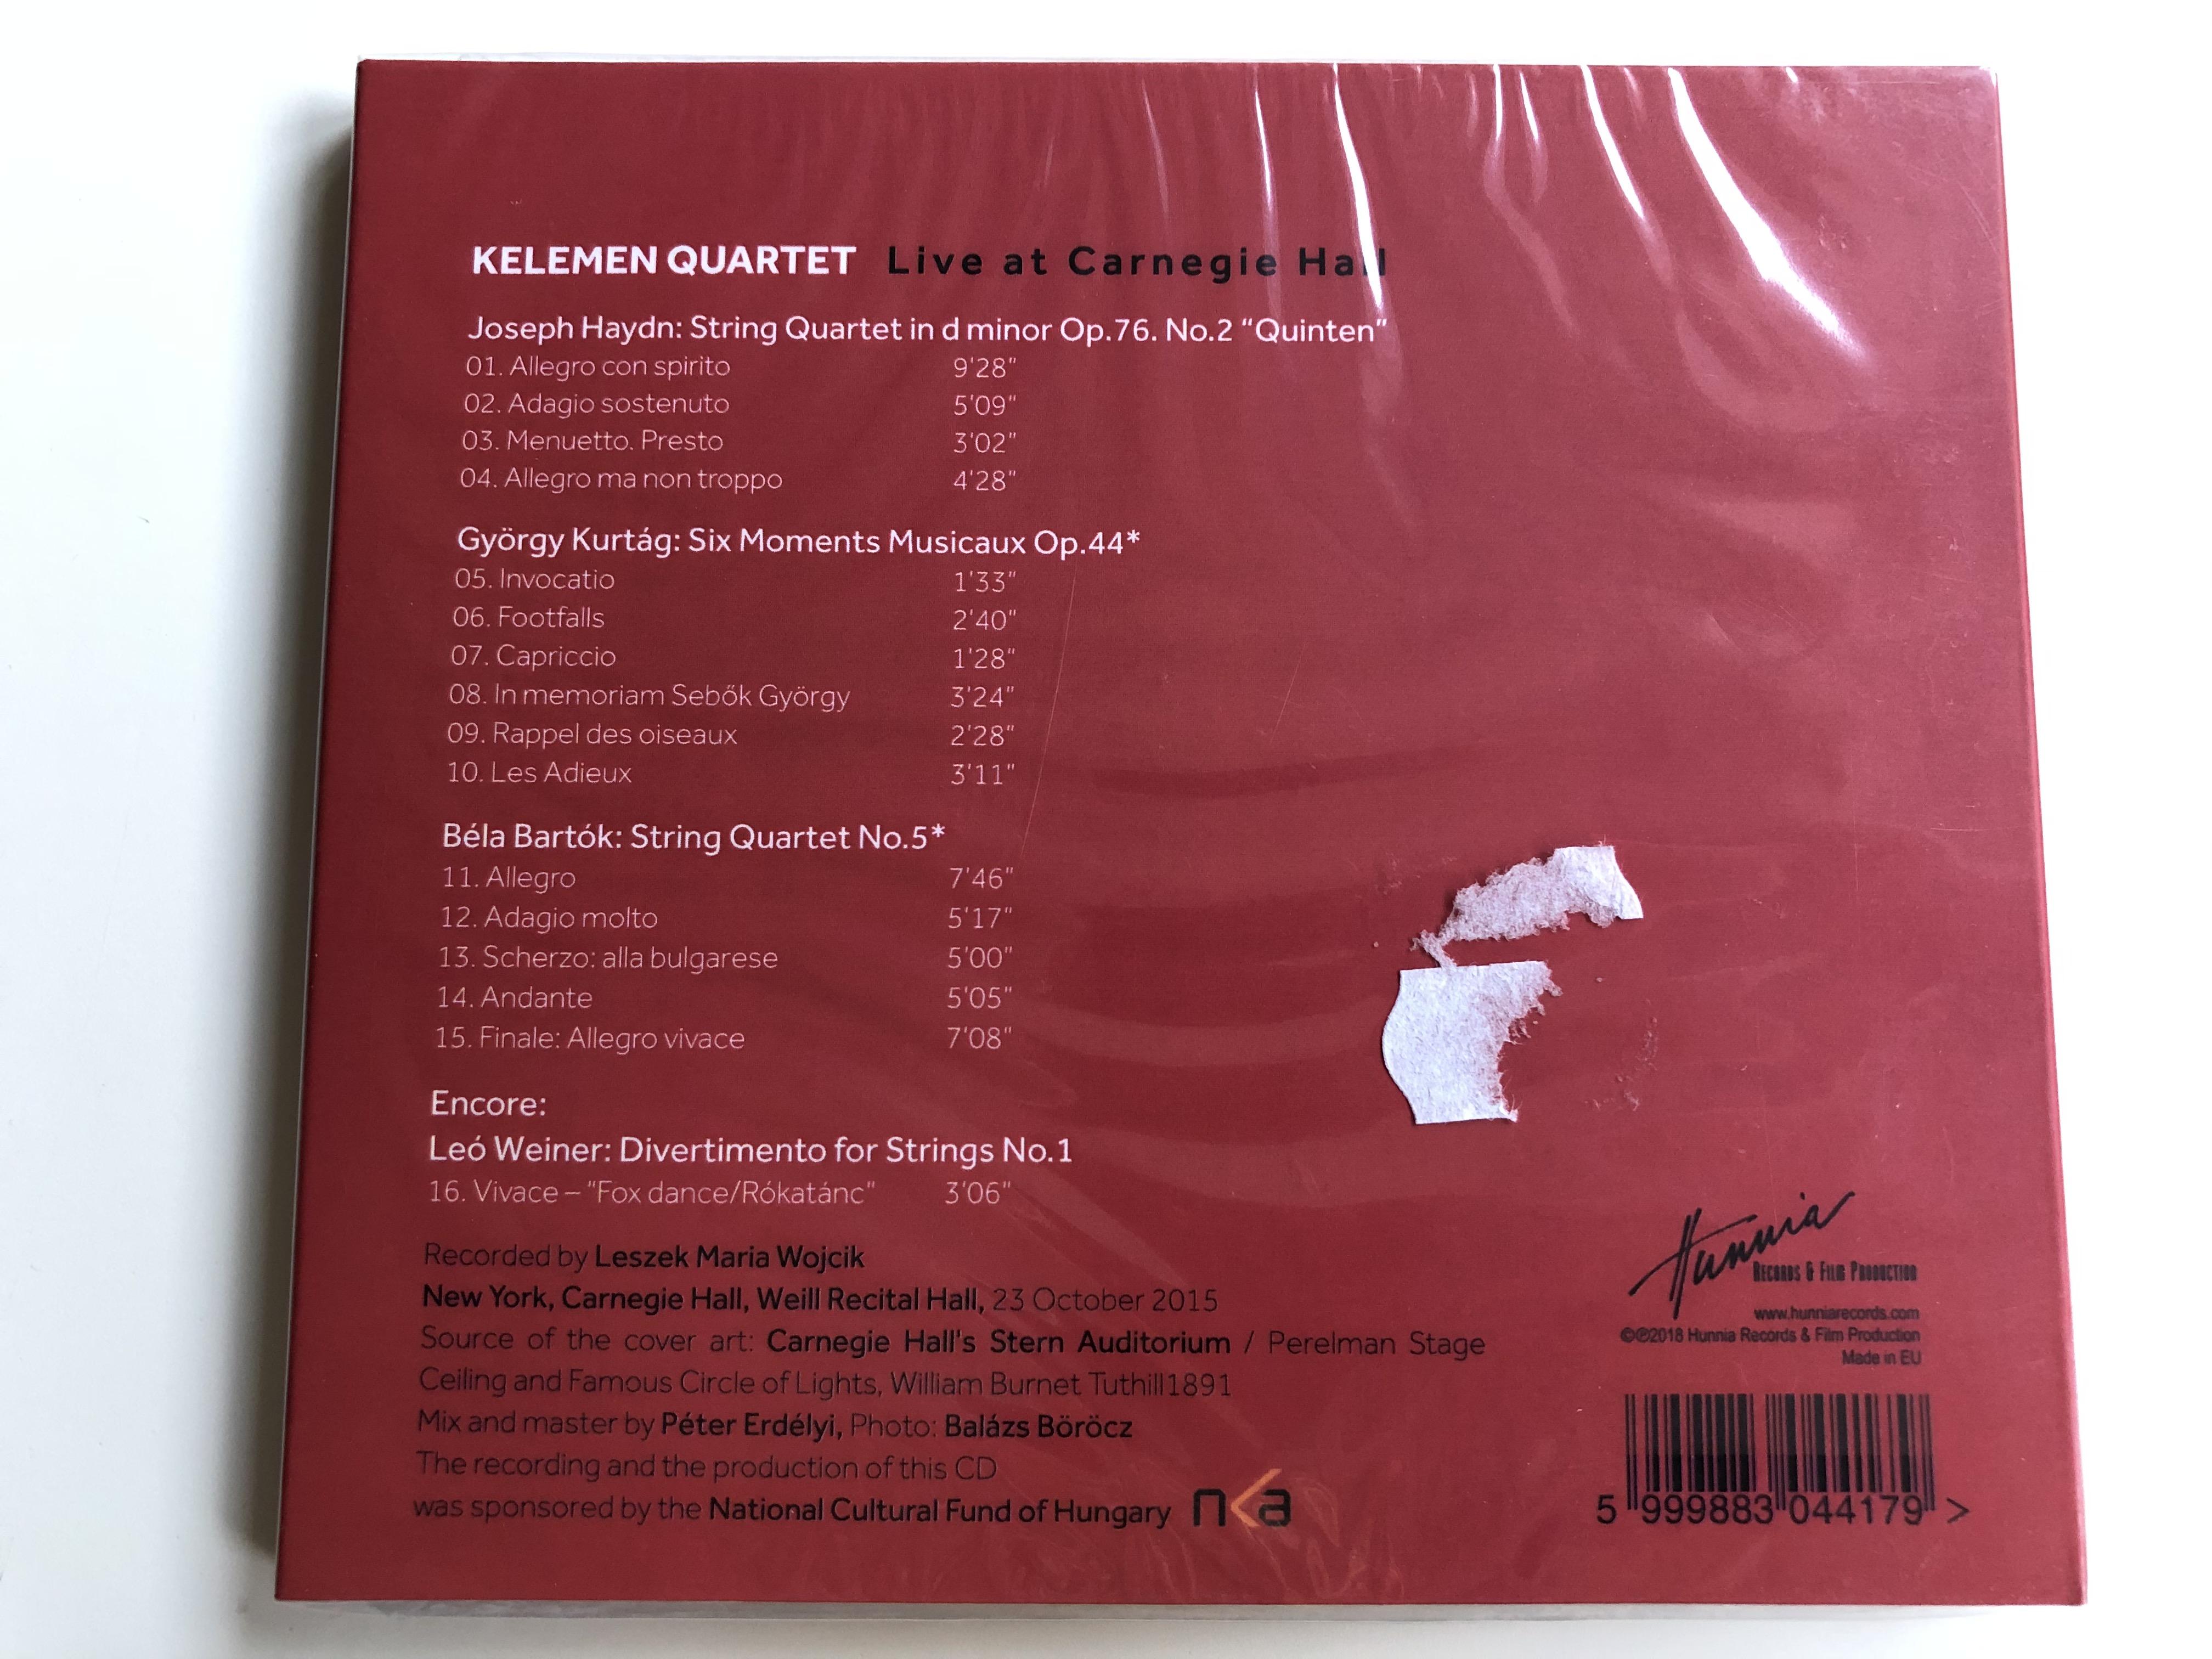 kelemen-quartet-live-at-carnegie-hall-hunnia-records-film-production-audio-cd-2018-hrcd-1517-2-.jpg